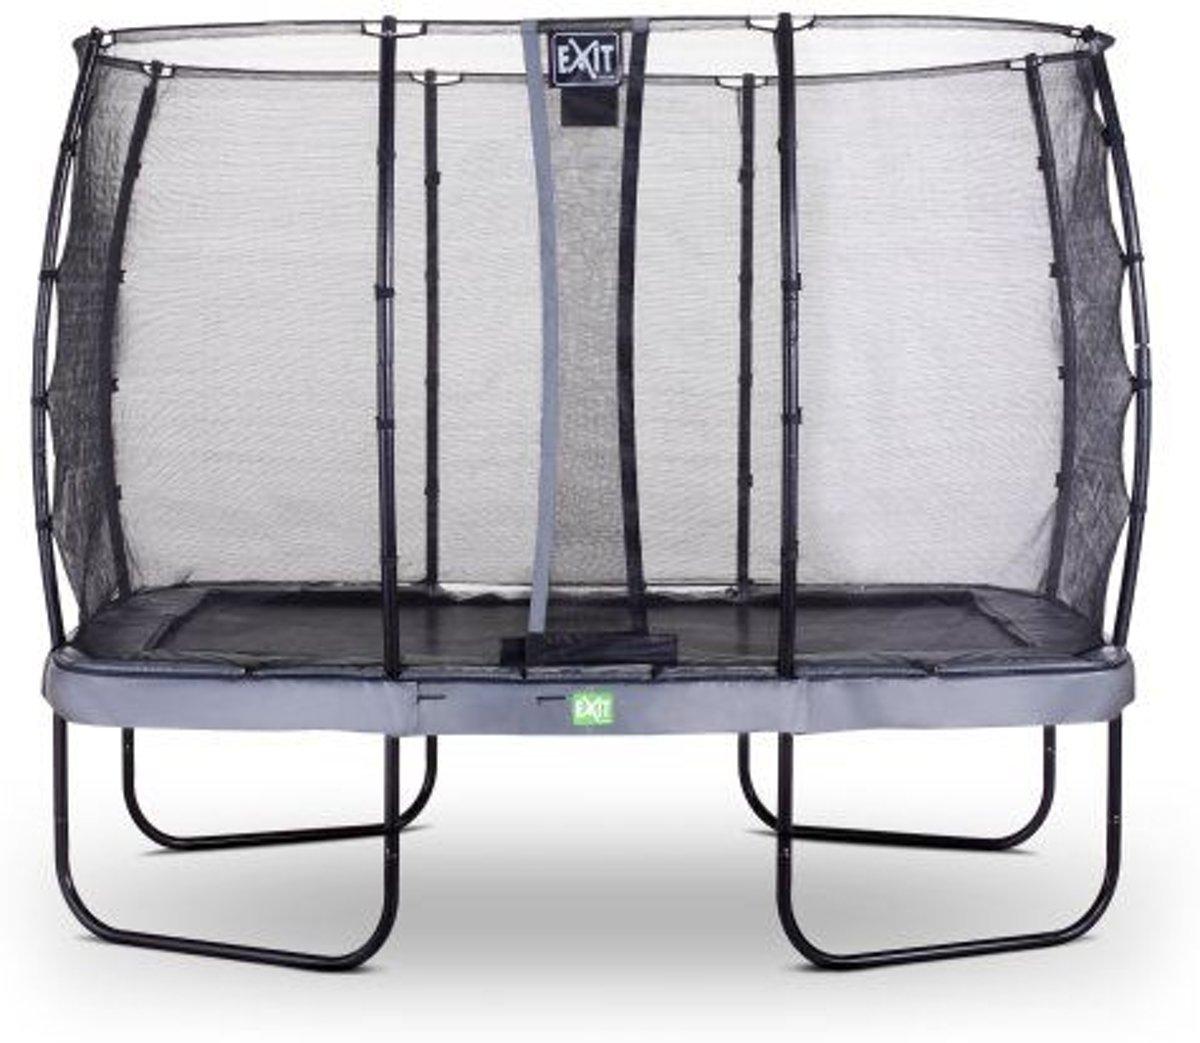 EXIT Elegant Premium trampoline 244x427cm met veiligheidsnet Economy - grijs